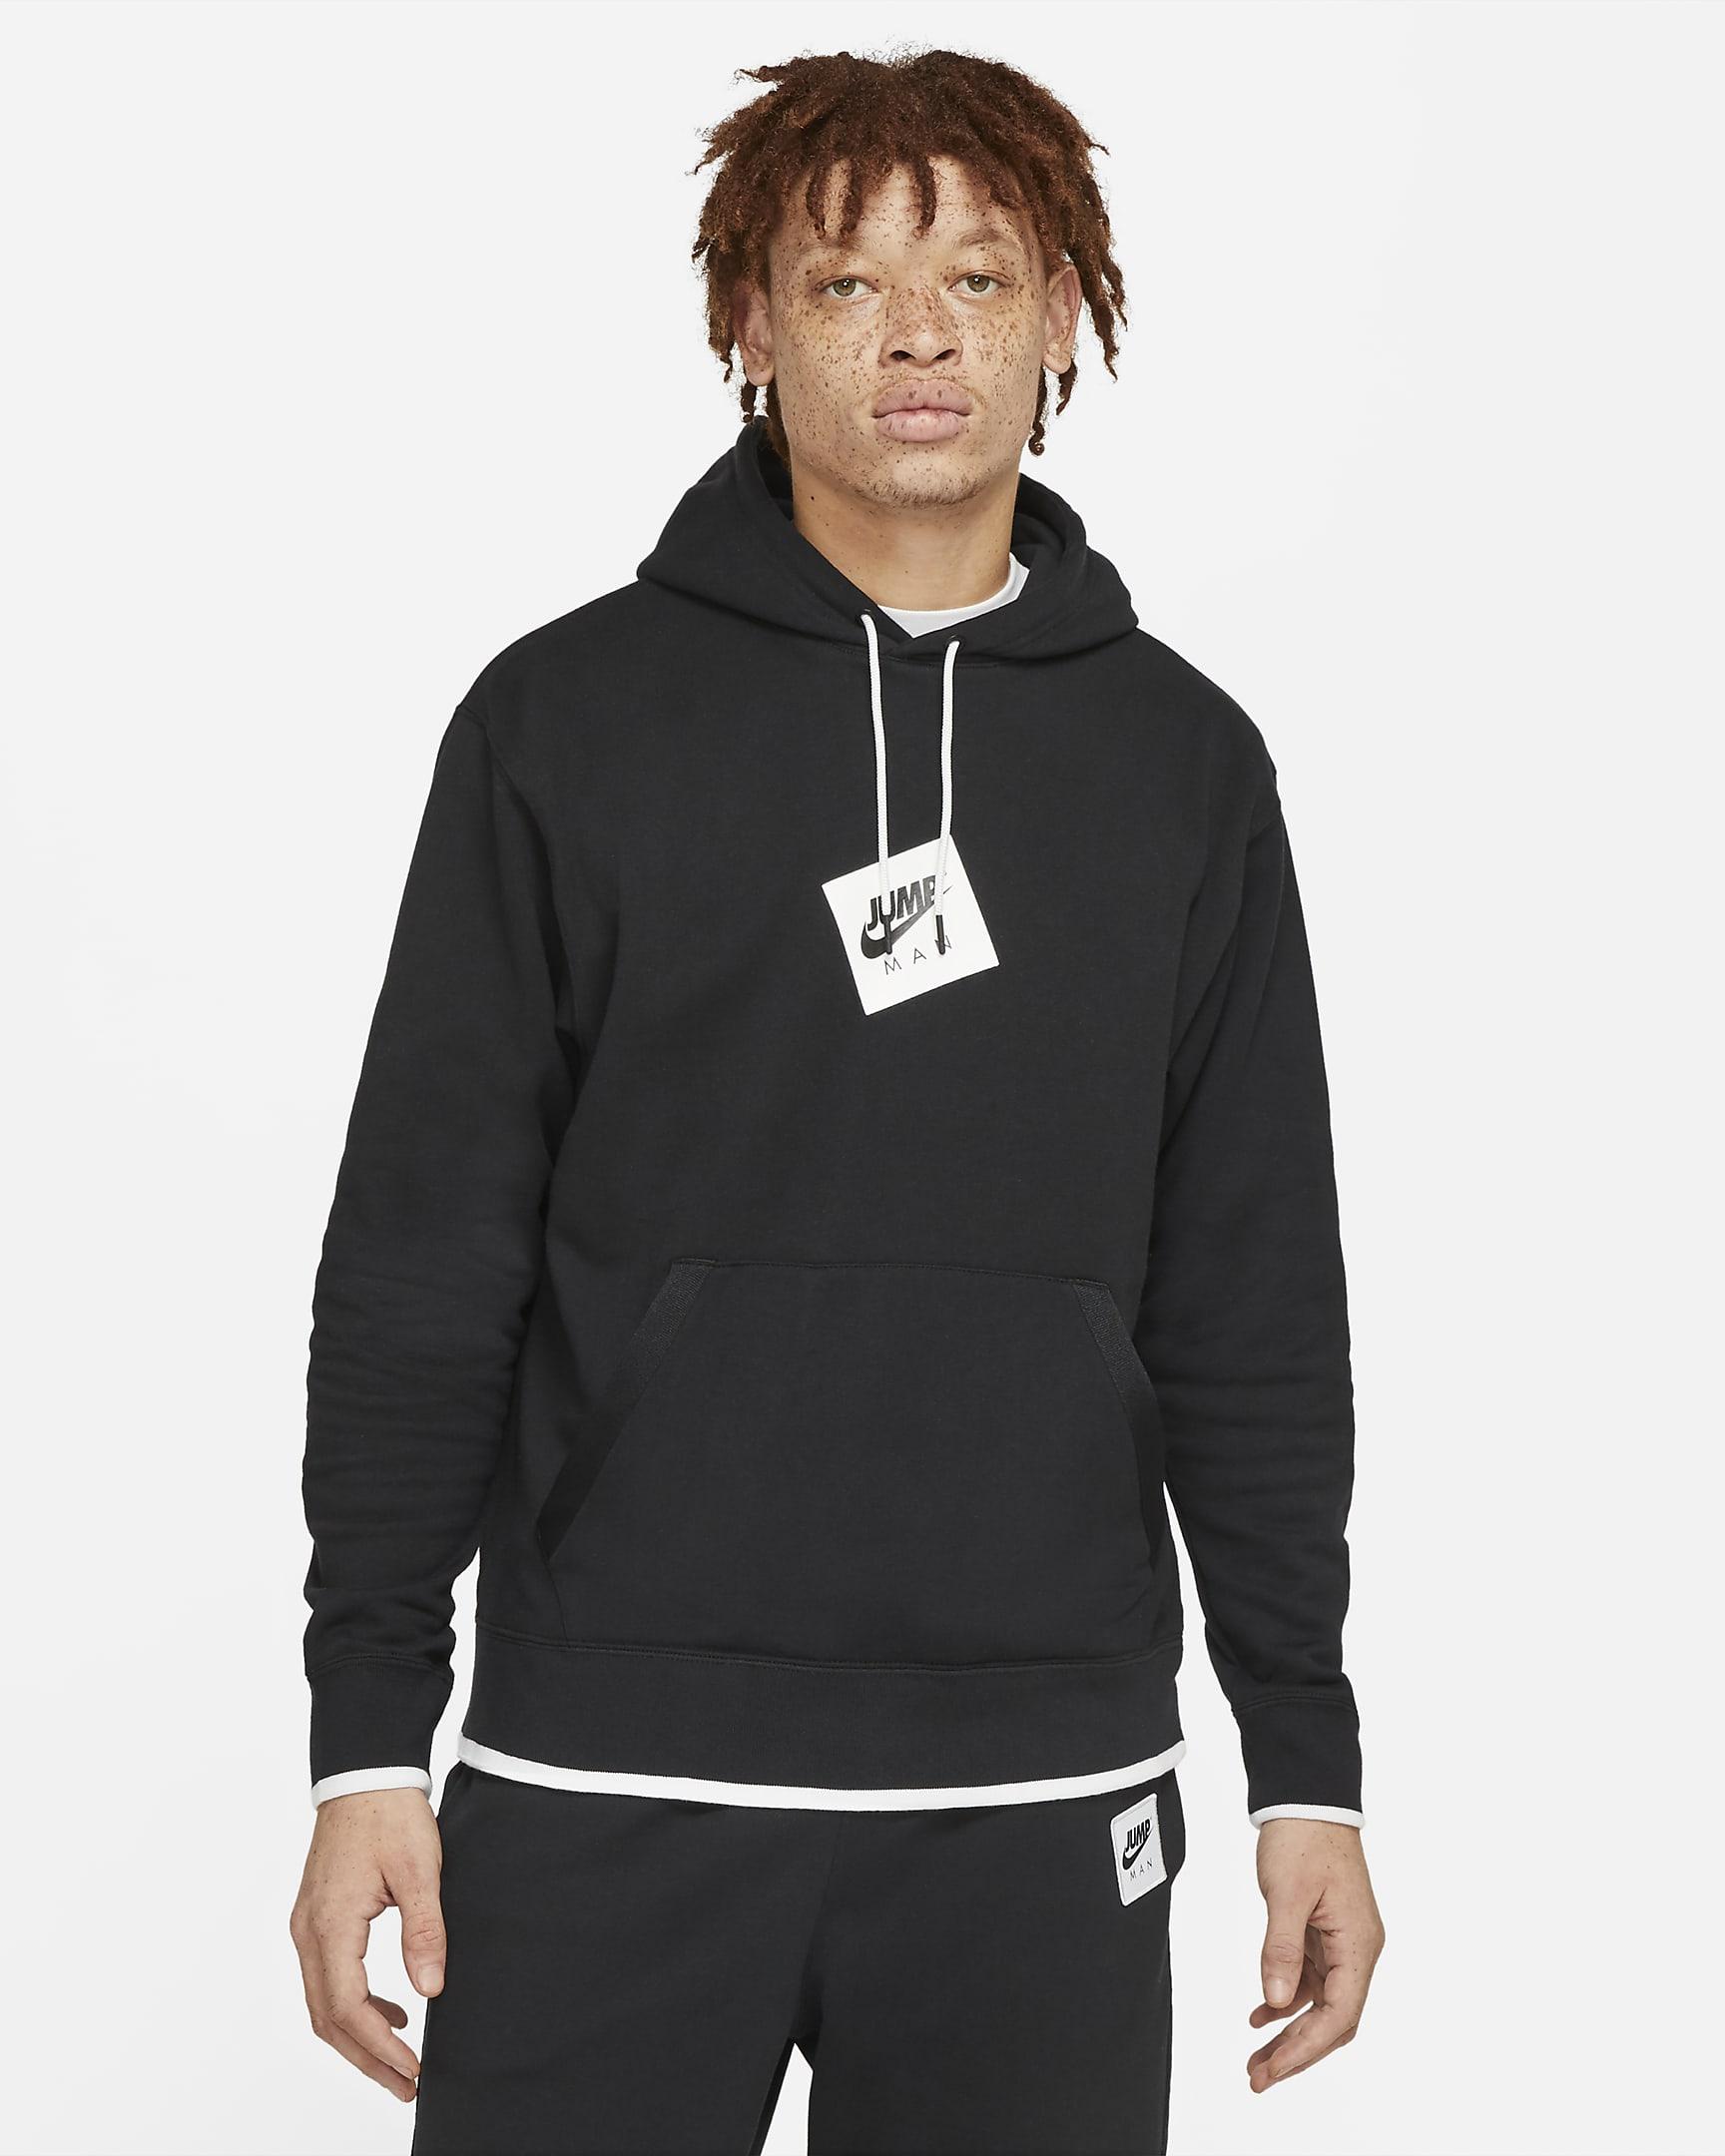 jordan-jumpman-classics-mens-printed-fleece-pullover-hoodie-hz0Q9t-2